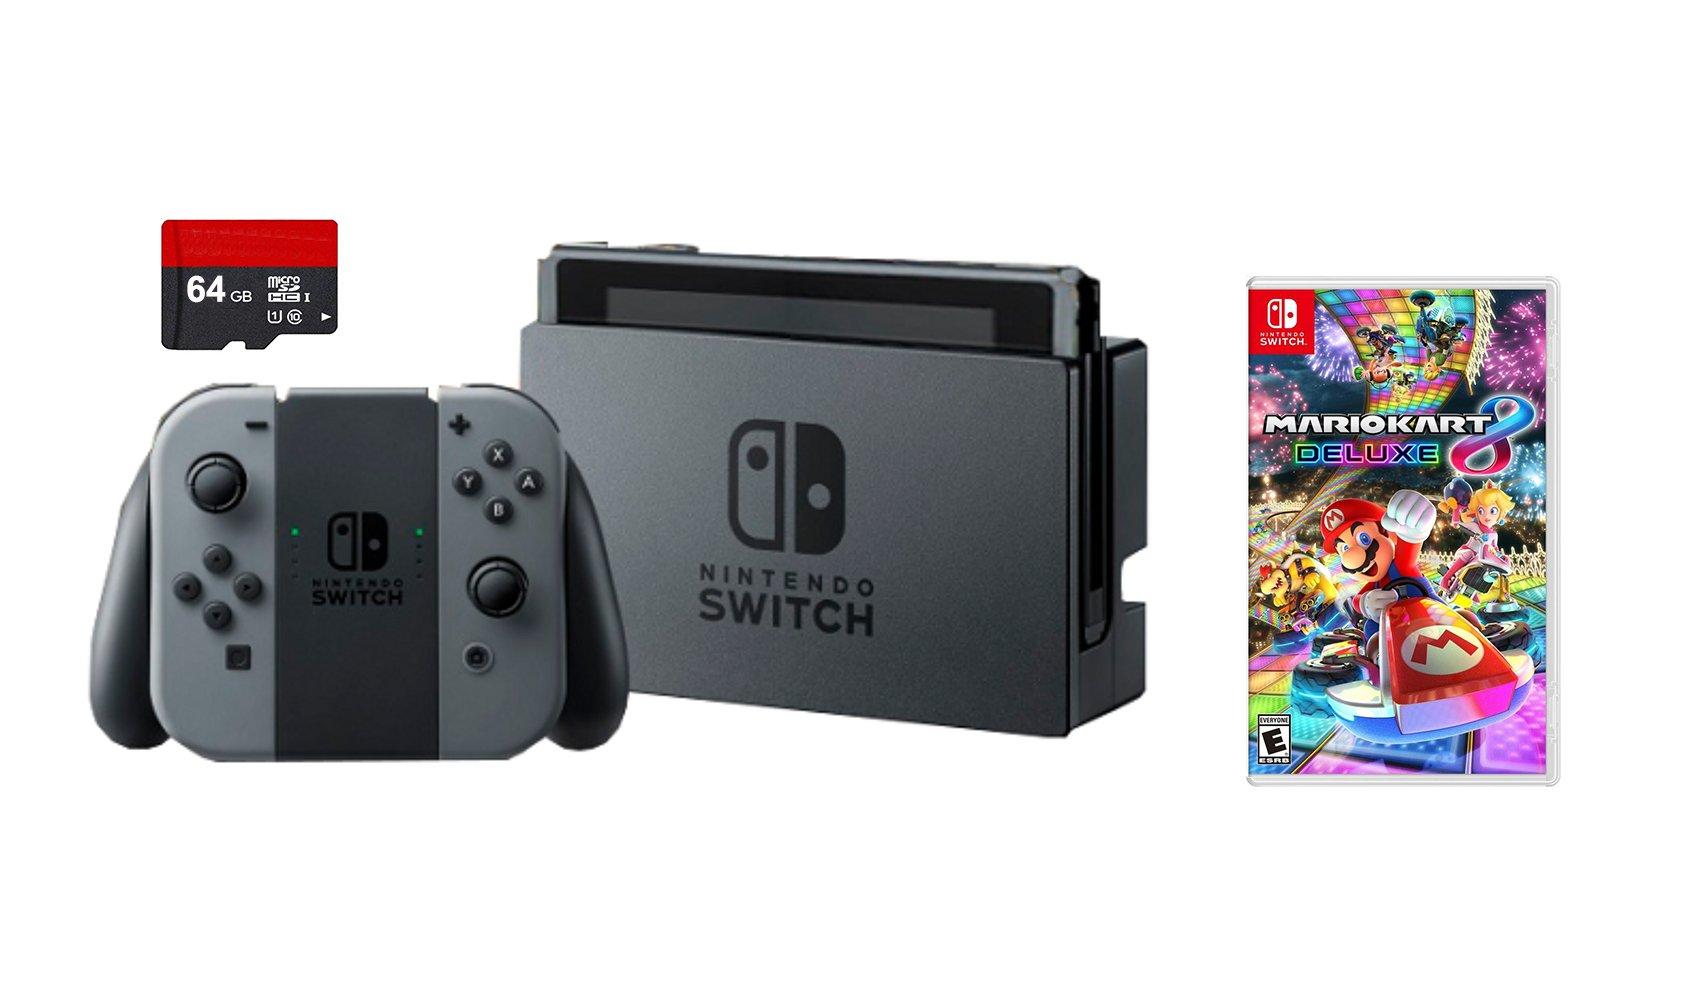 Nintendo Switch 3 items Bundle:Nintendo Switch 32GB Console Gray Joy-con,64GB Micro SD Memory Card and Mario Kart 8 Deluxe